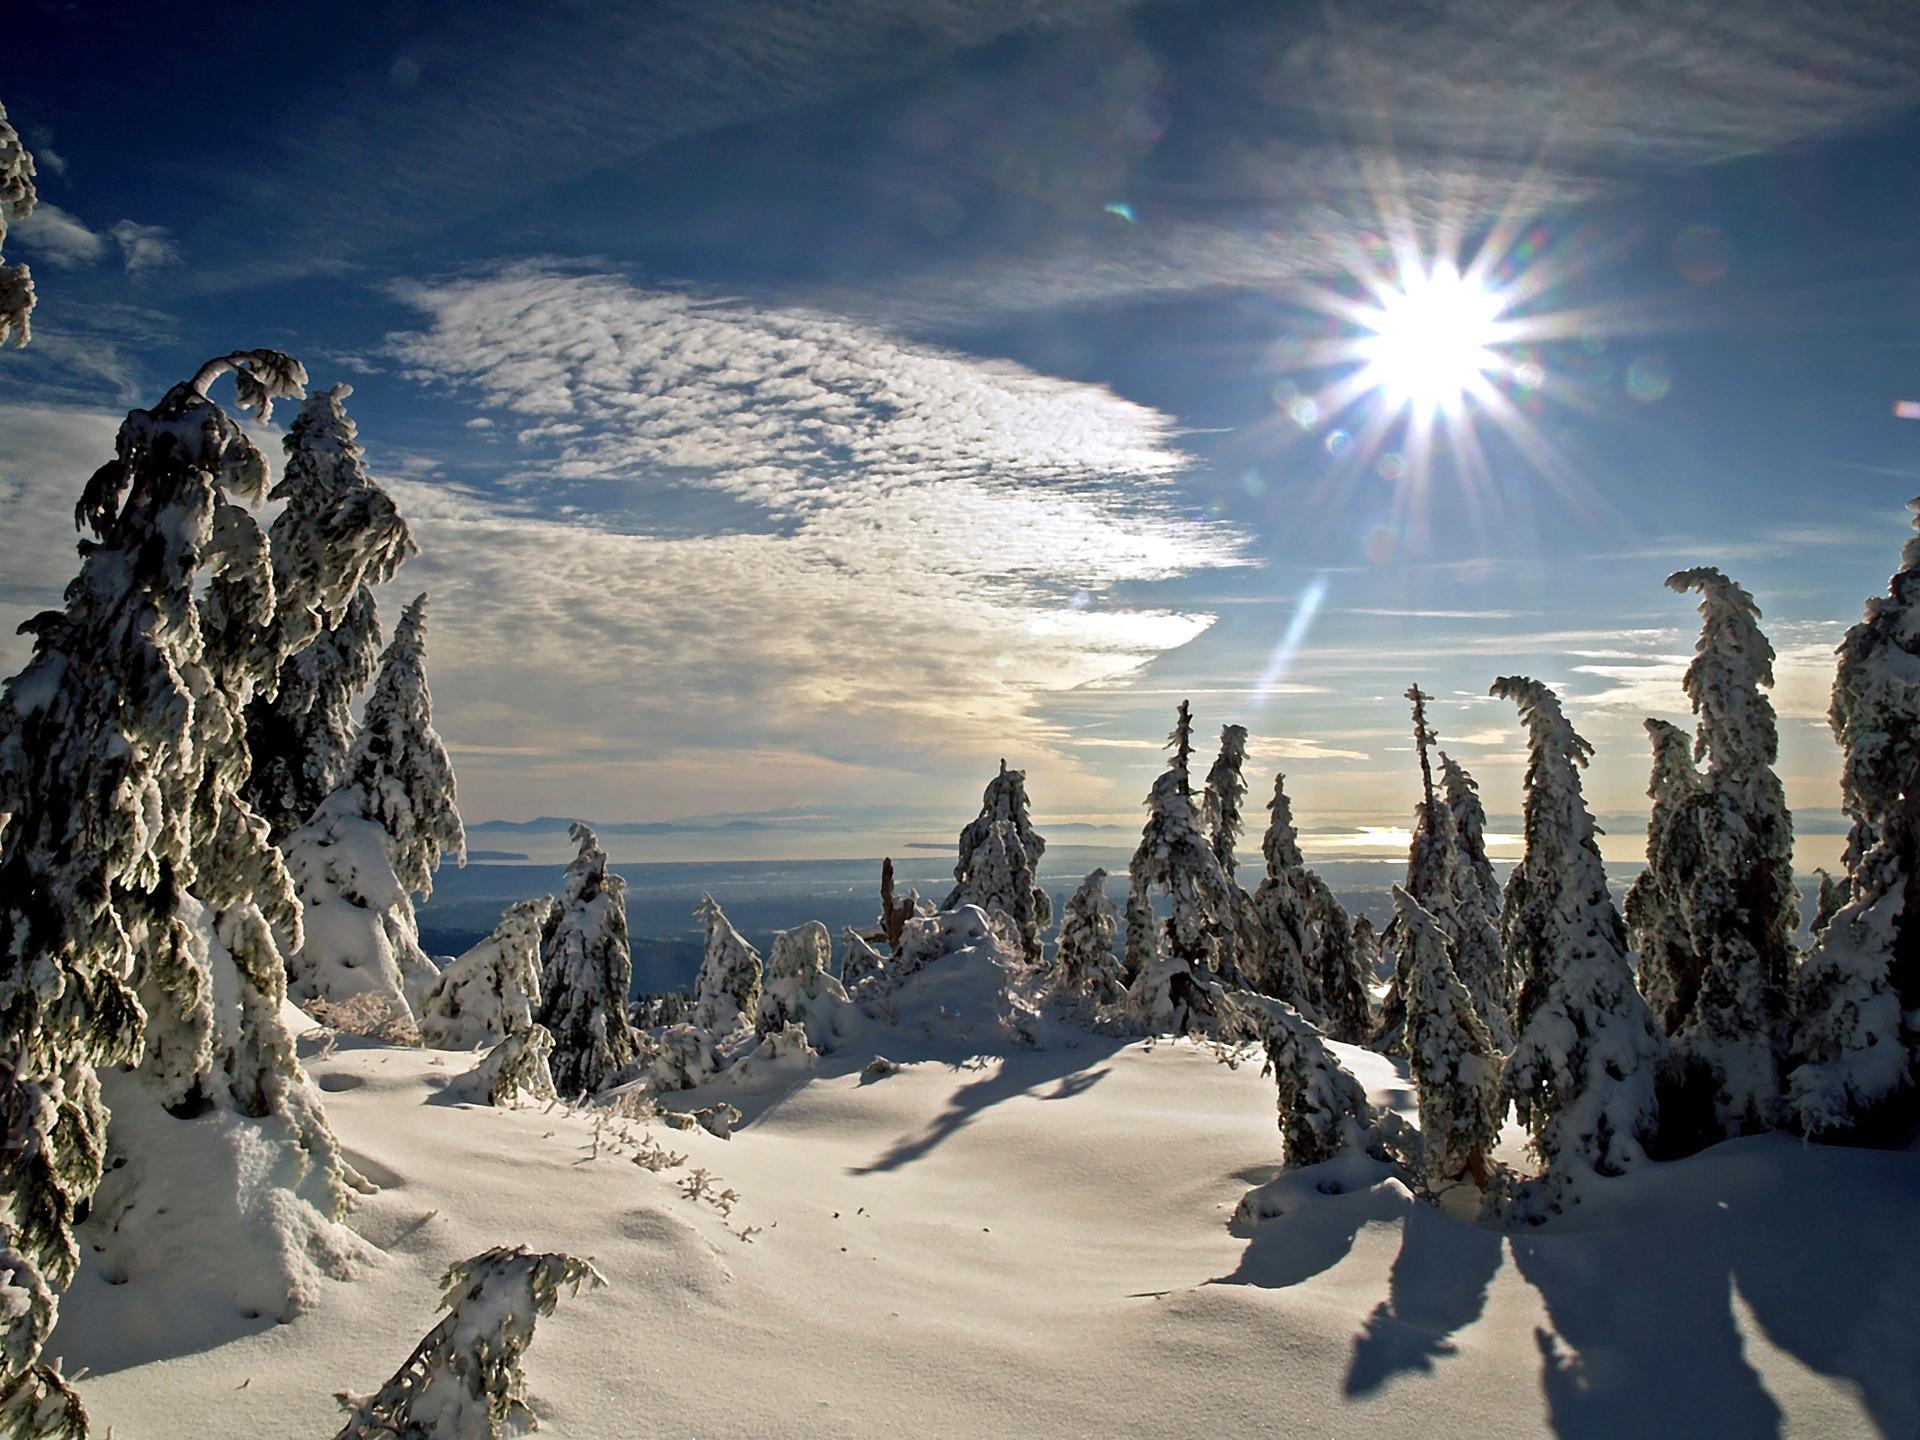 Winter Sun Wallpaper Winter Nature Wallpapers in jpg format for free